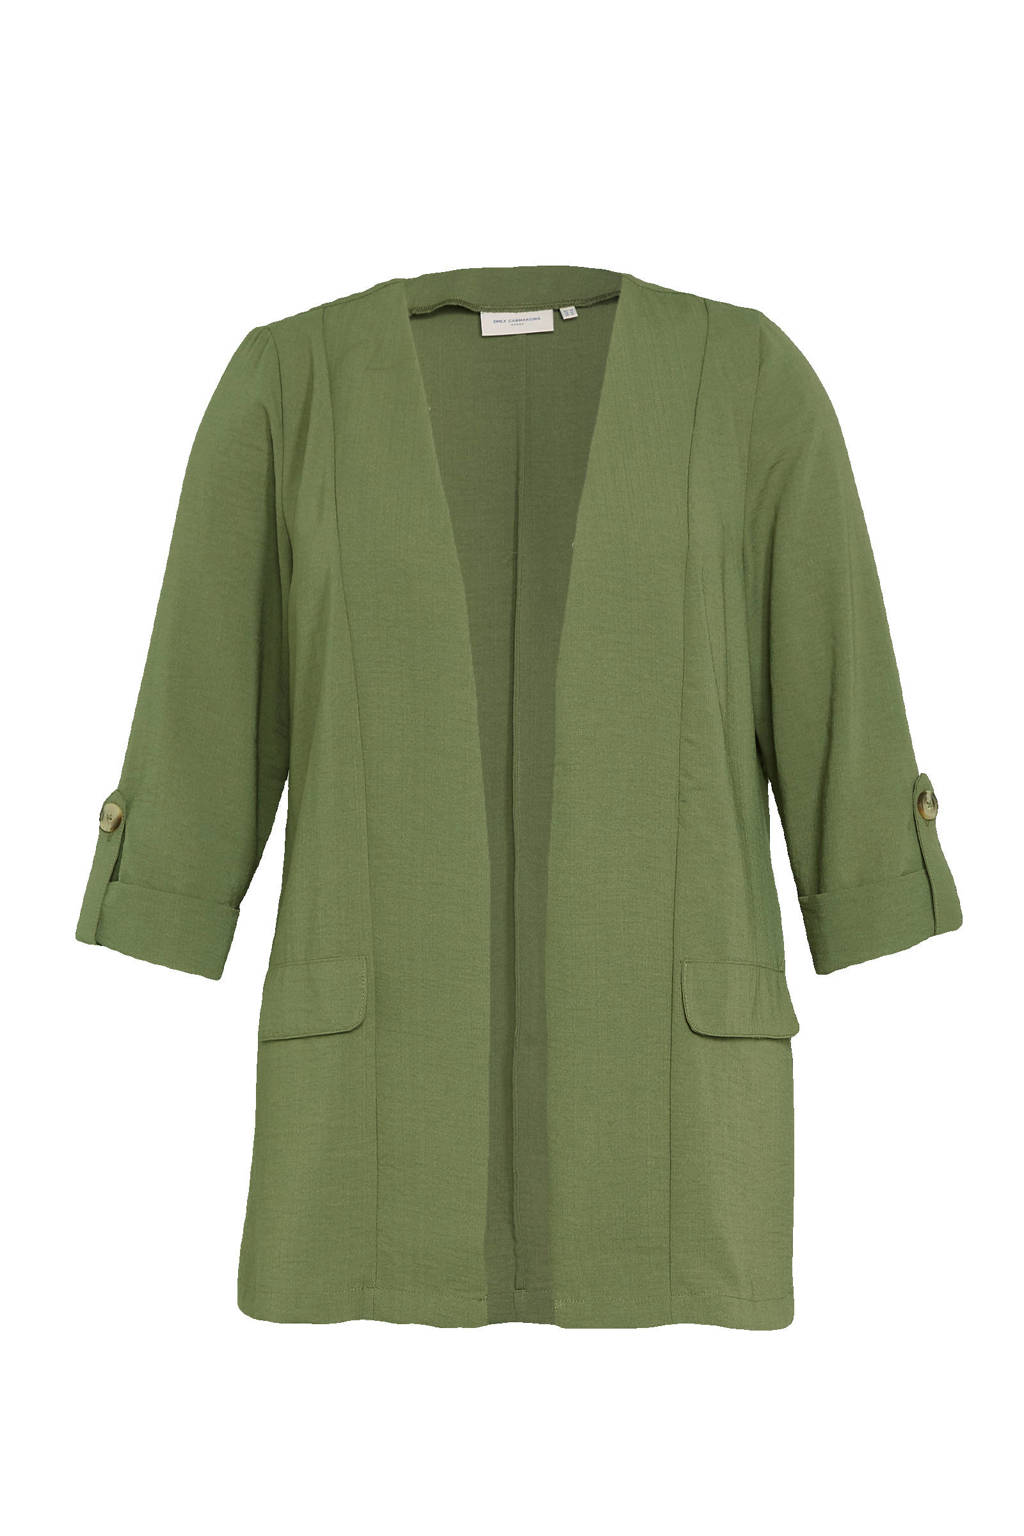 ONLY CARMAKOMA blazer groen, Groen